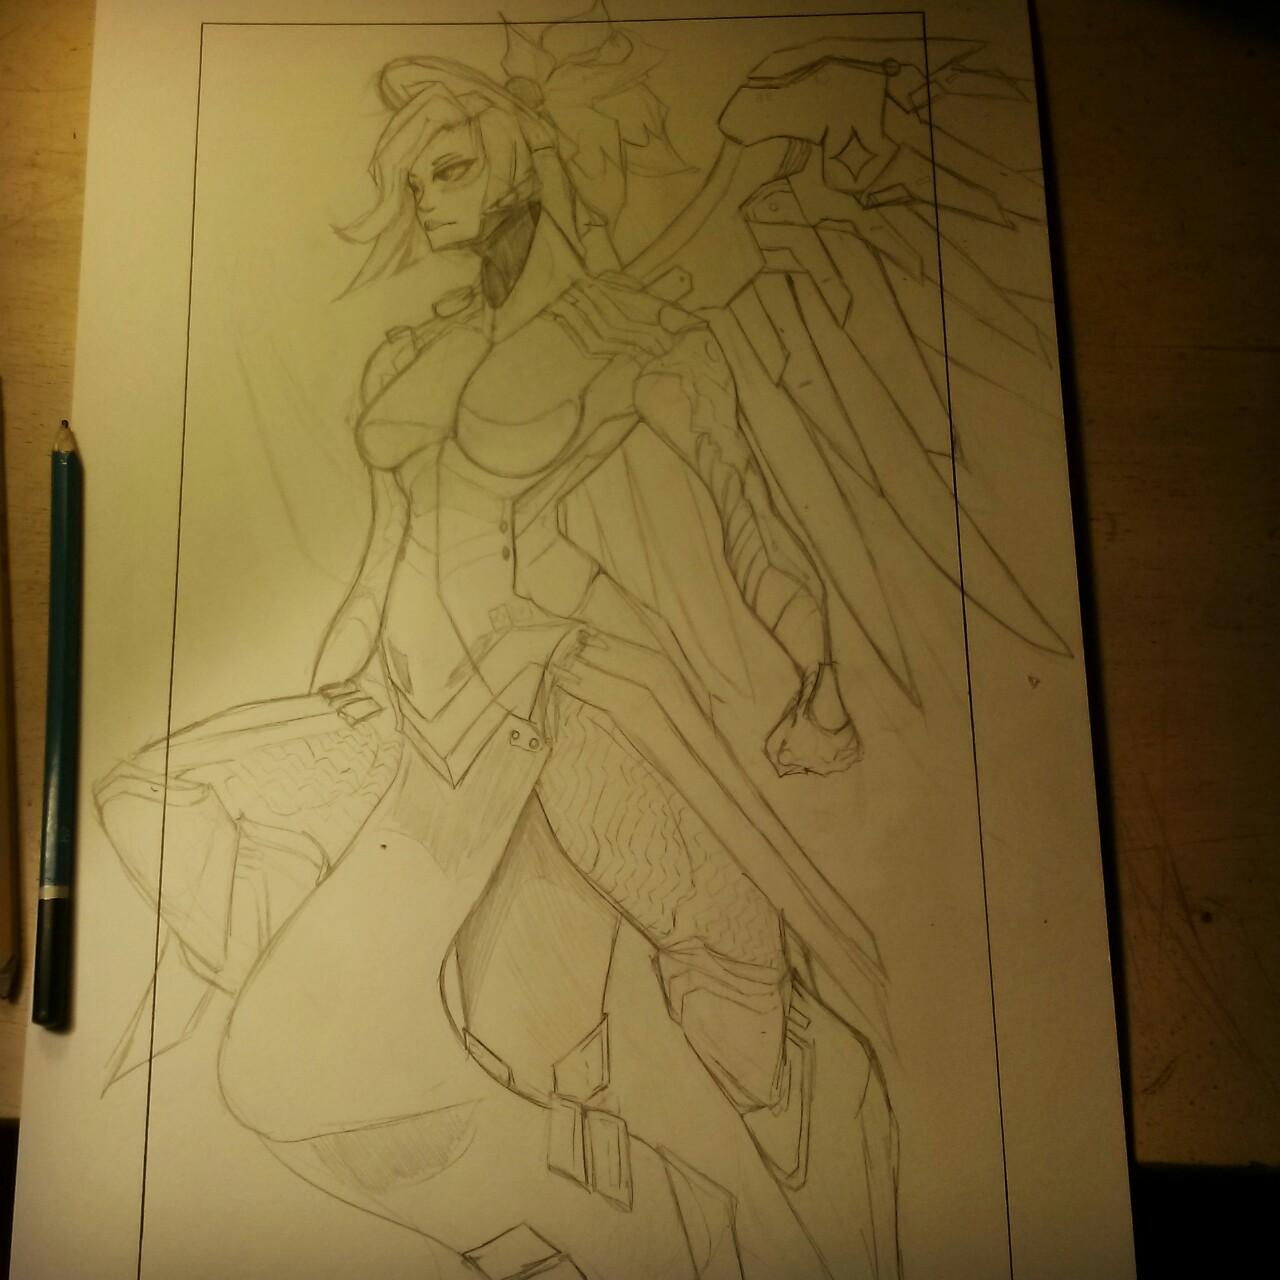 Mercy (Sketch)